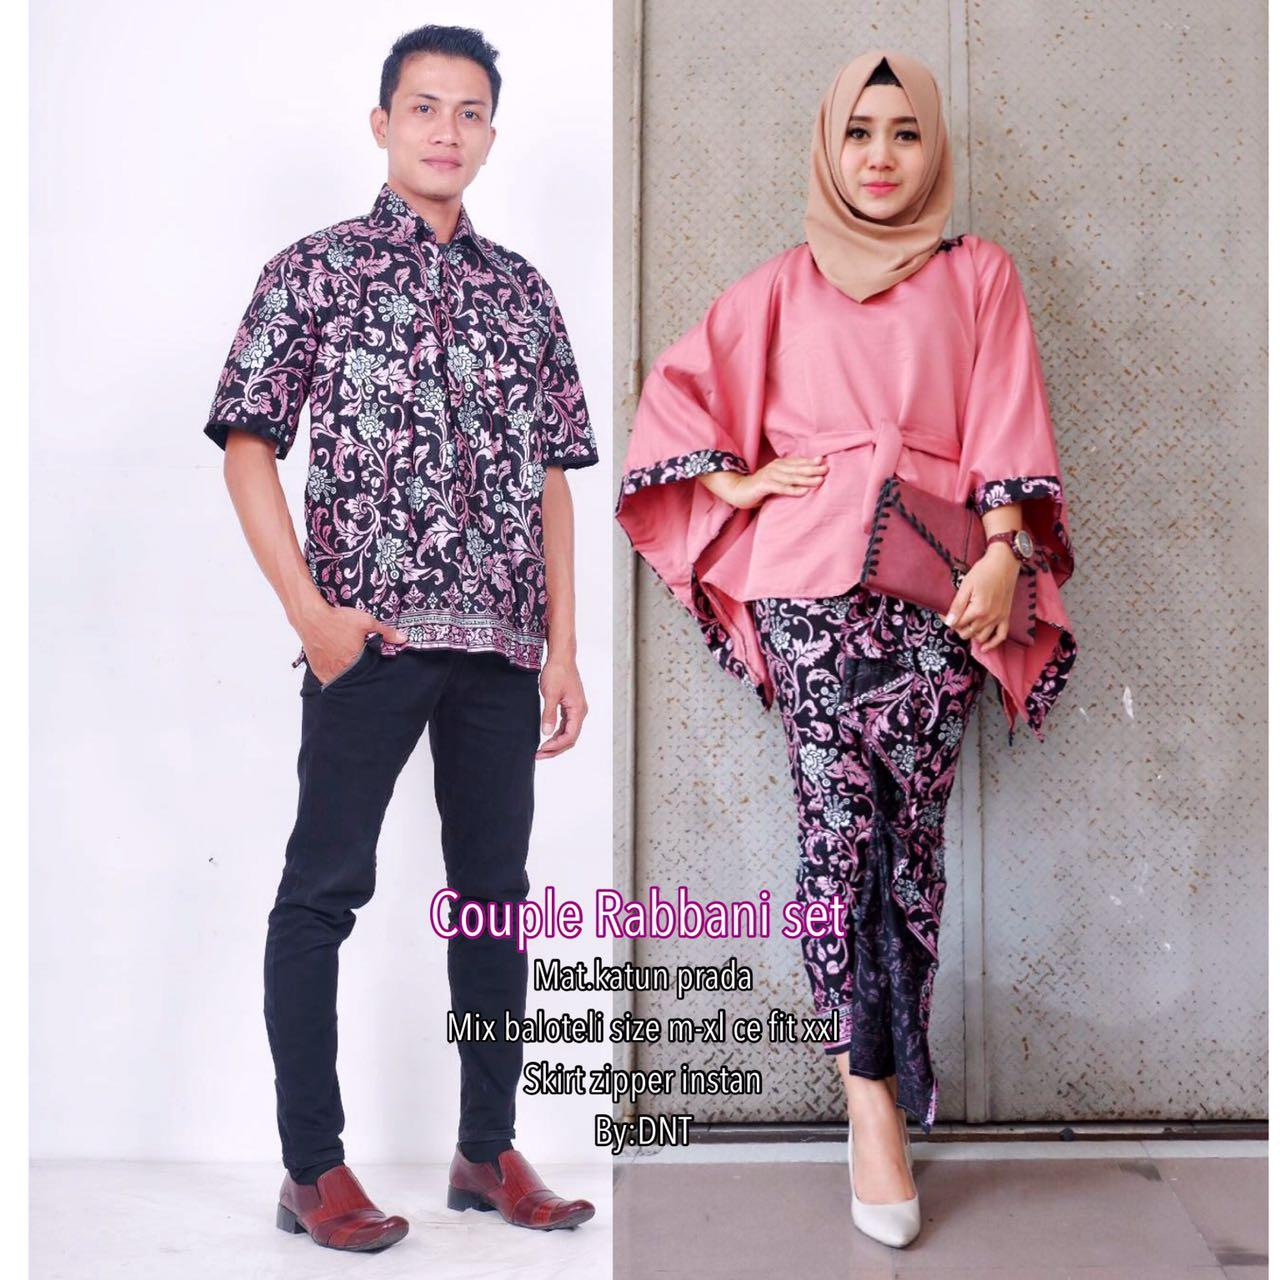 Baju Batik Couple  Batik Sarimbit   Baju Batik Kondangan   Batik Couple    Hem Batik ae18ebc0e9